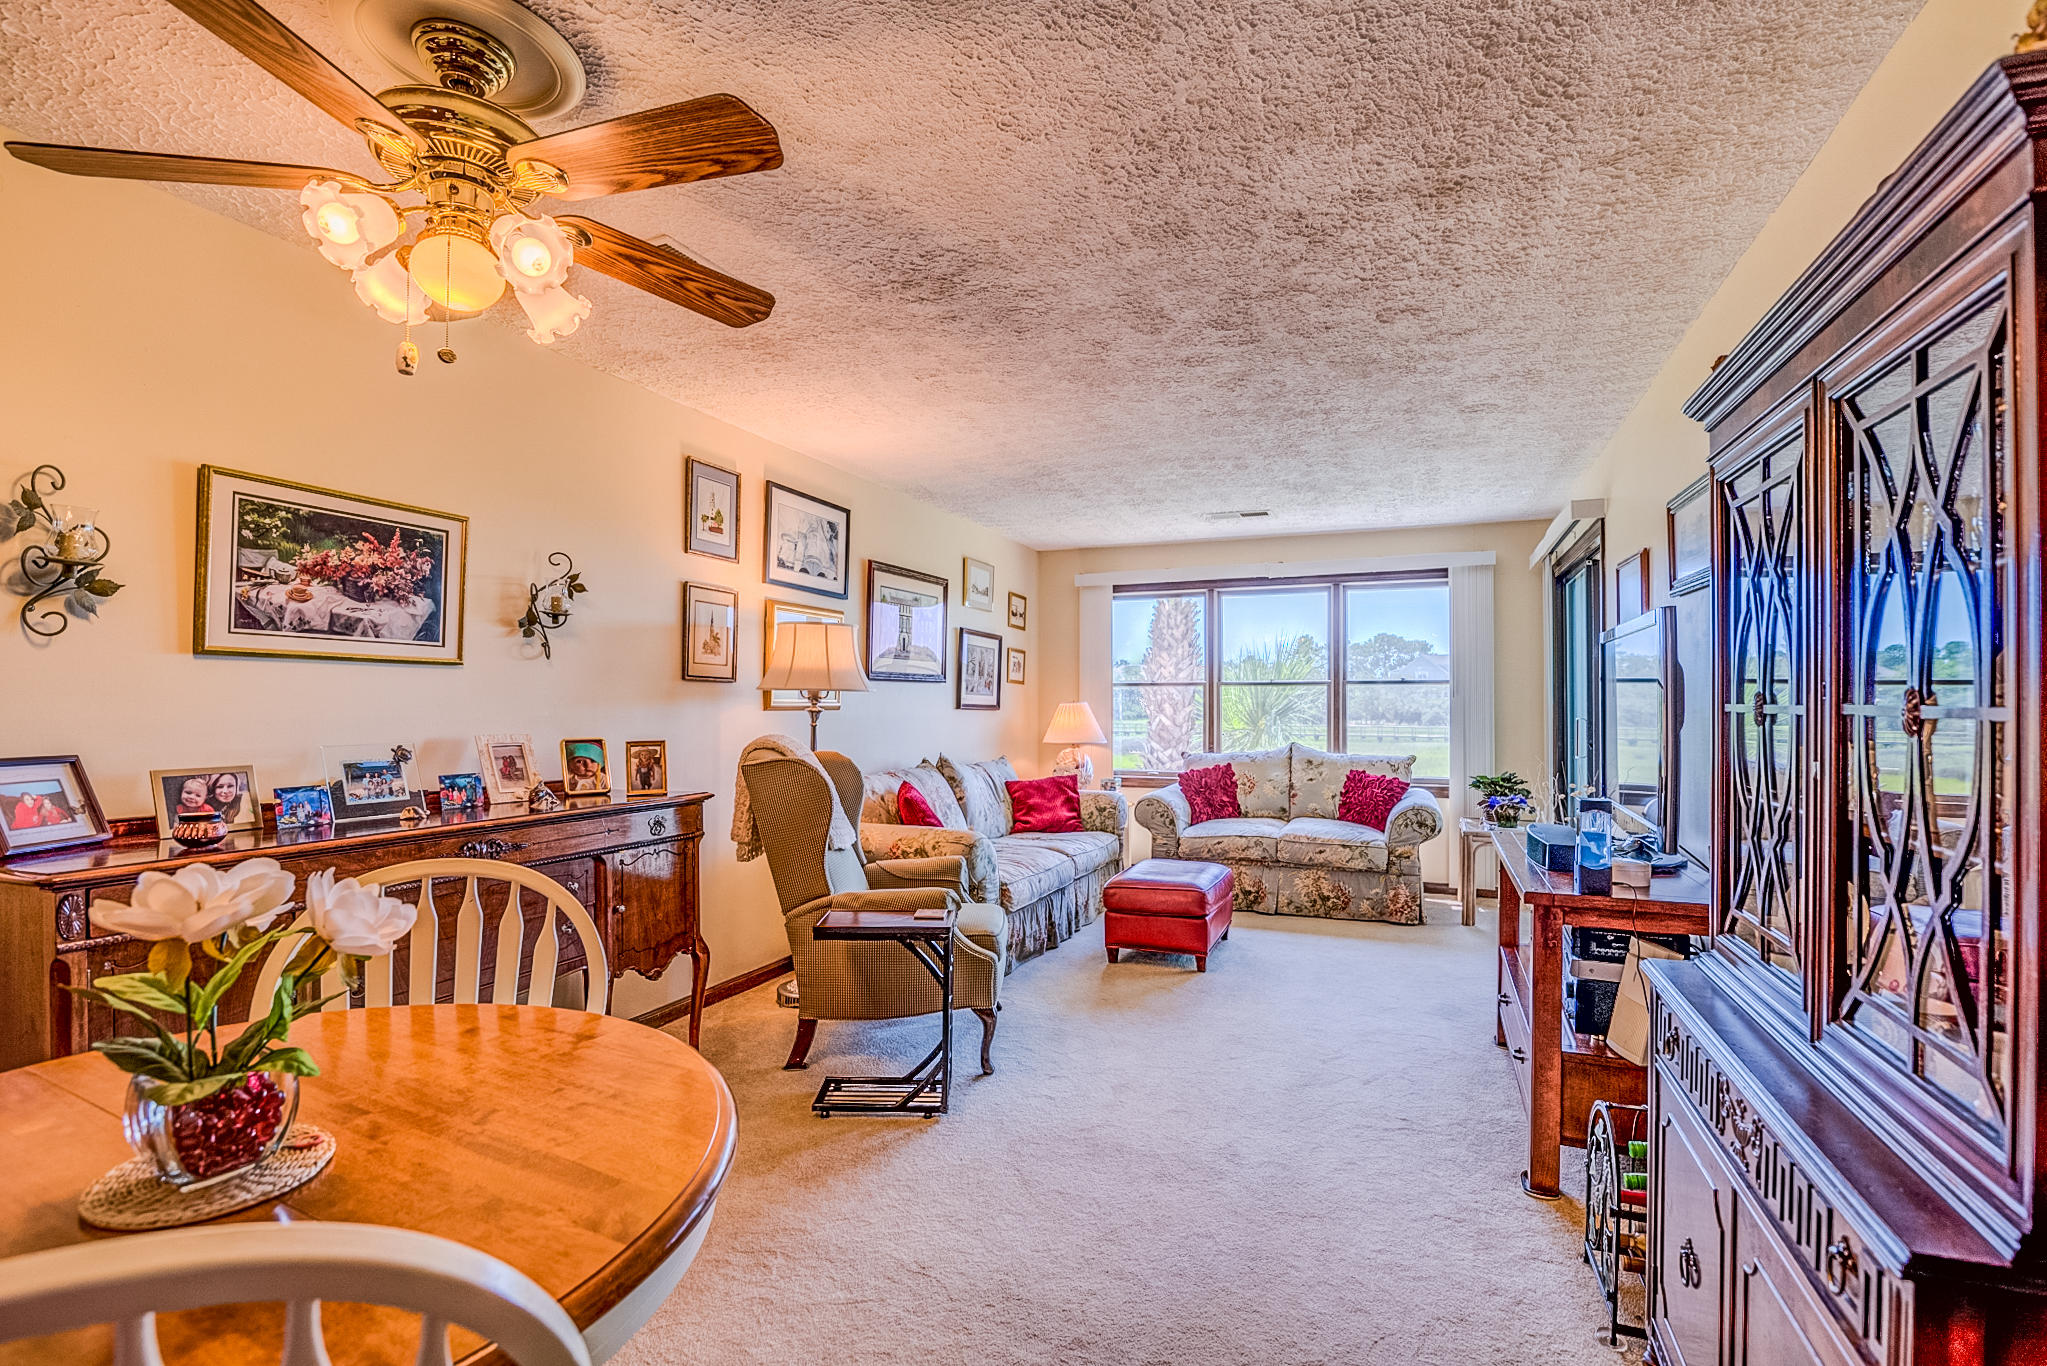 Bay Pointe Villas Homes For Sale - 2127 Landfall, Johns Island, SC - 9